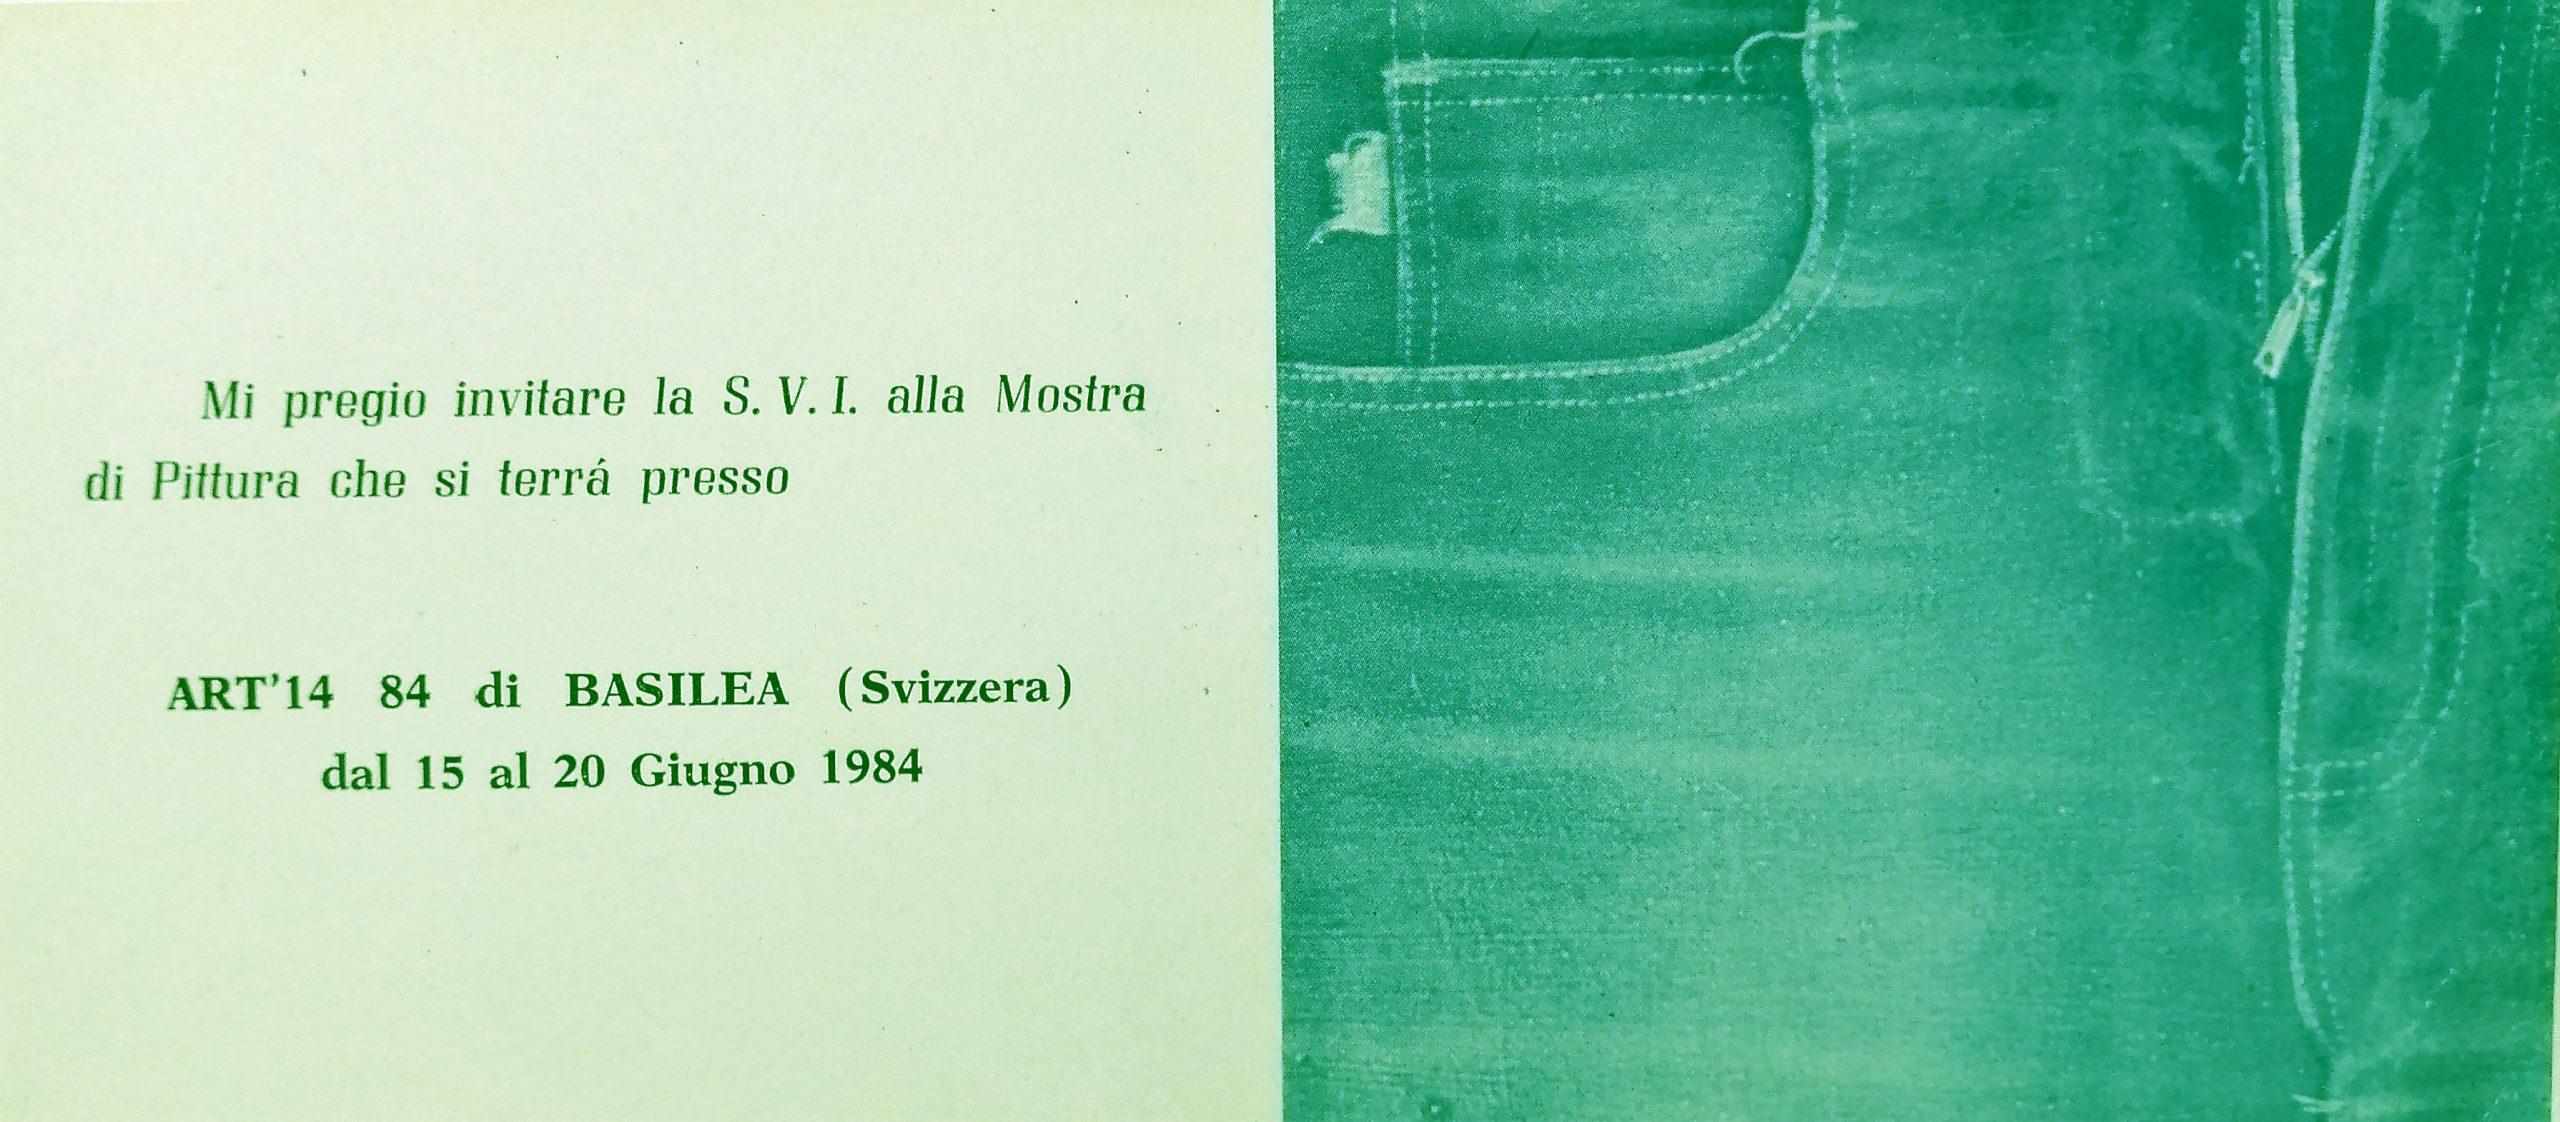 1984 ART14 84 di Basilea Svizzera scaled - Bibliography/ Catalogues